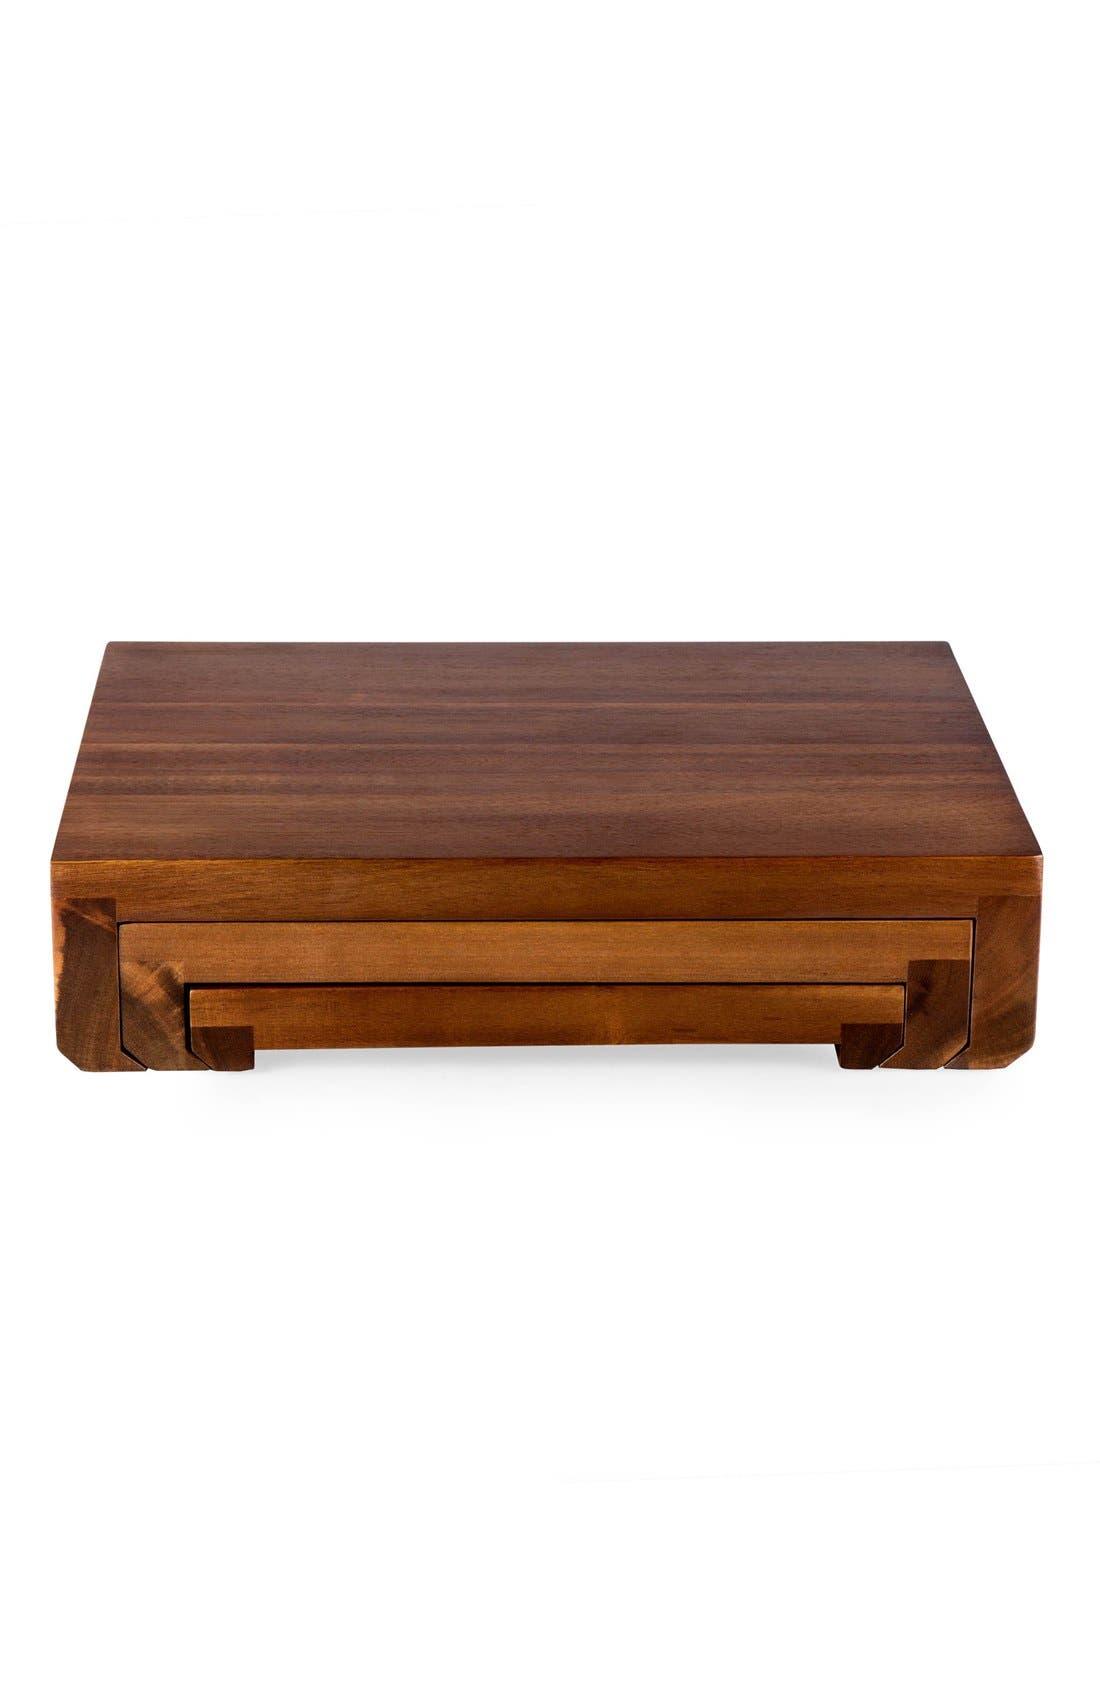 'Etage' Wood Serving Pedestals,                             Alternate thumbnail 4, color,                             200